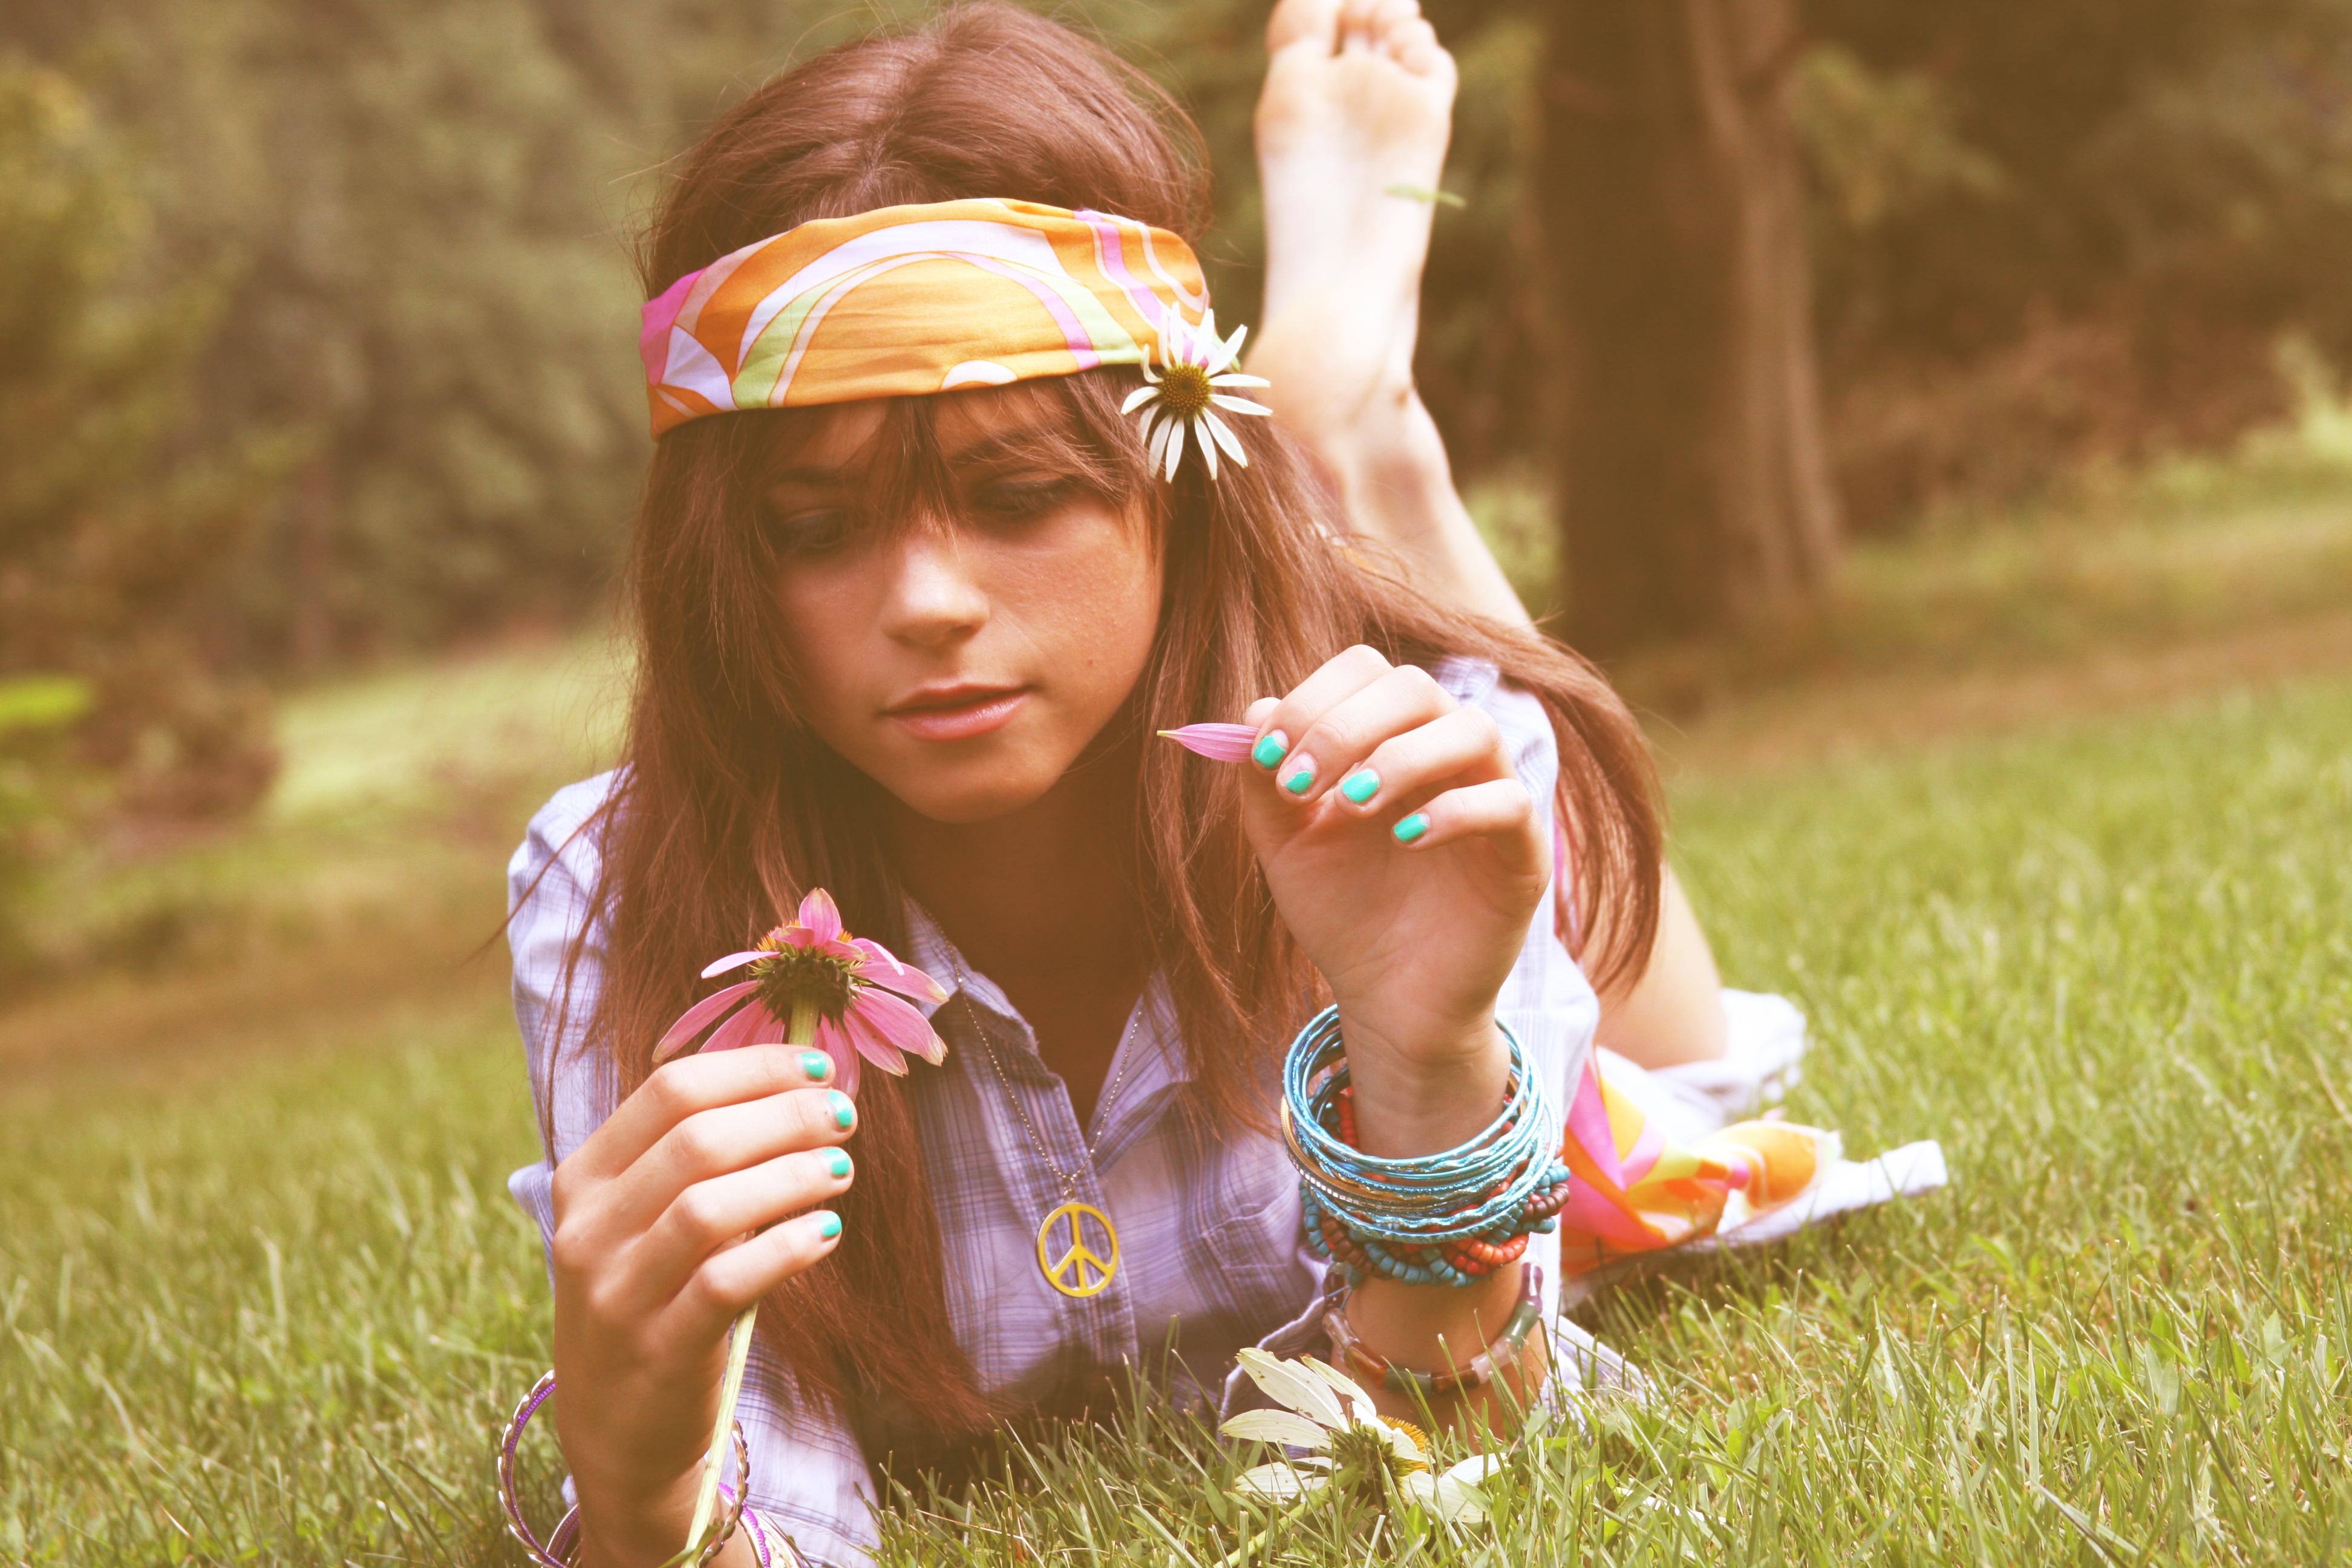 Hippy Girl | Erins Photoshoot Inspiration | Pinterest